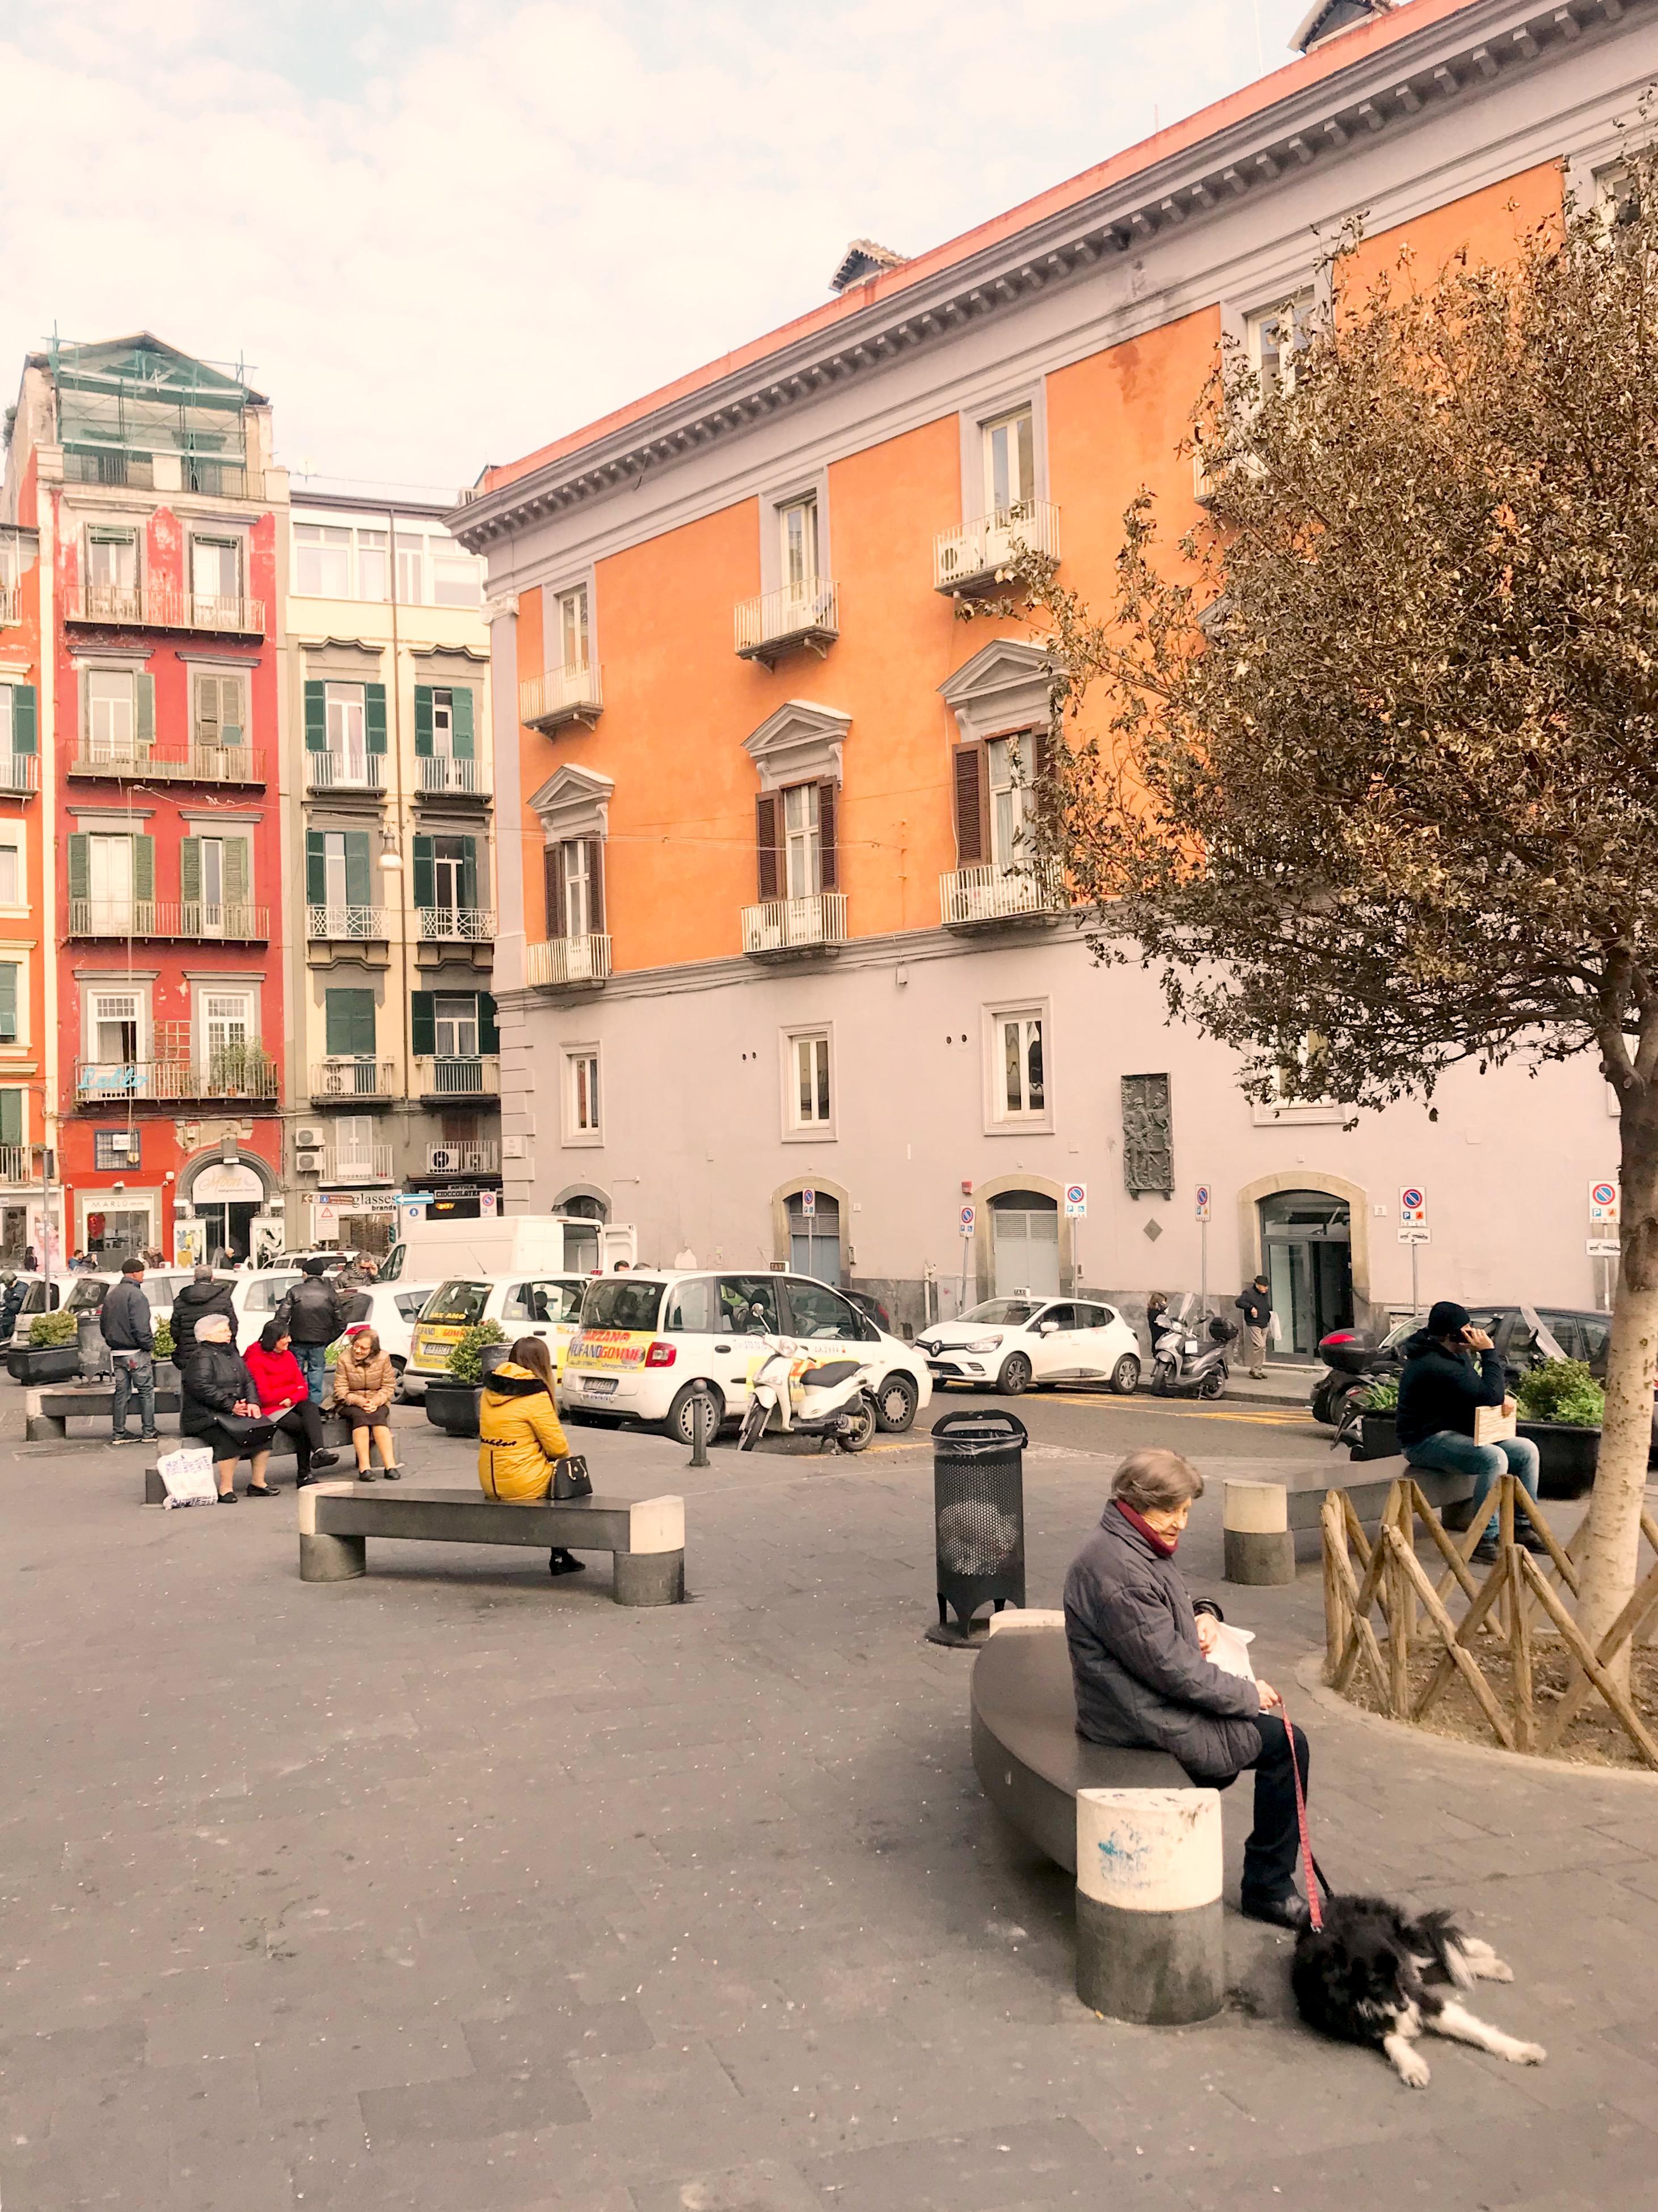 Fussgängerzone in Neapel